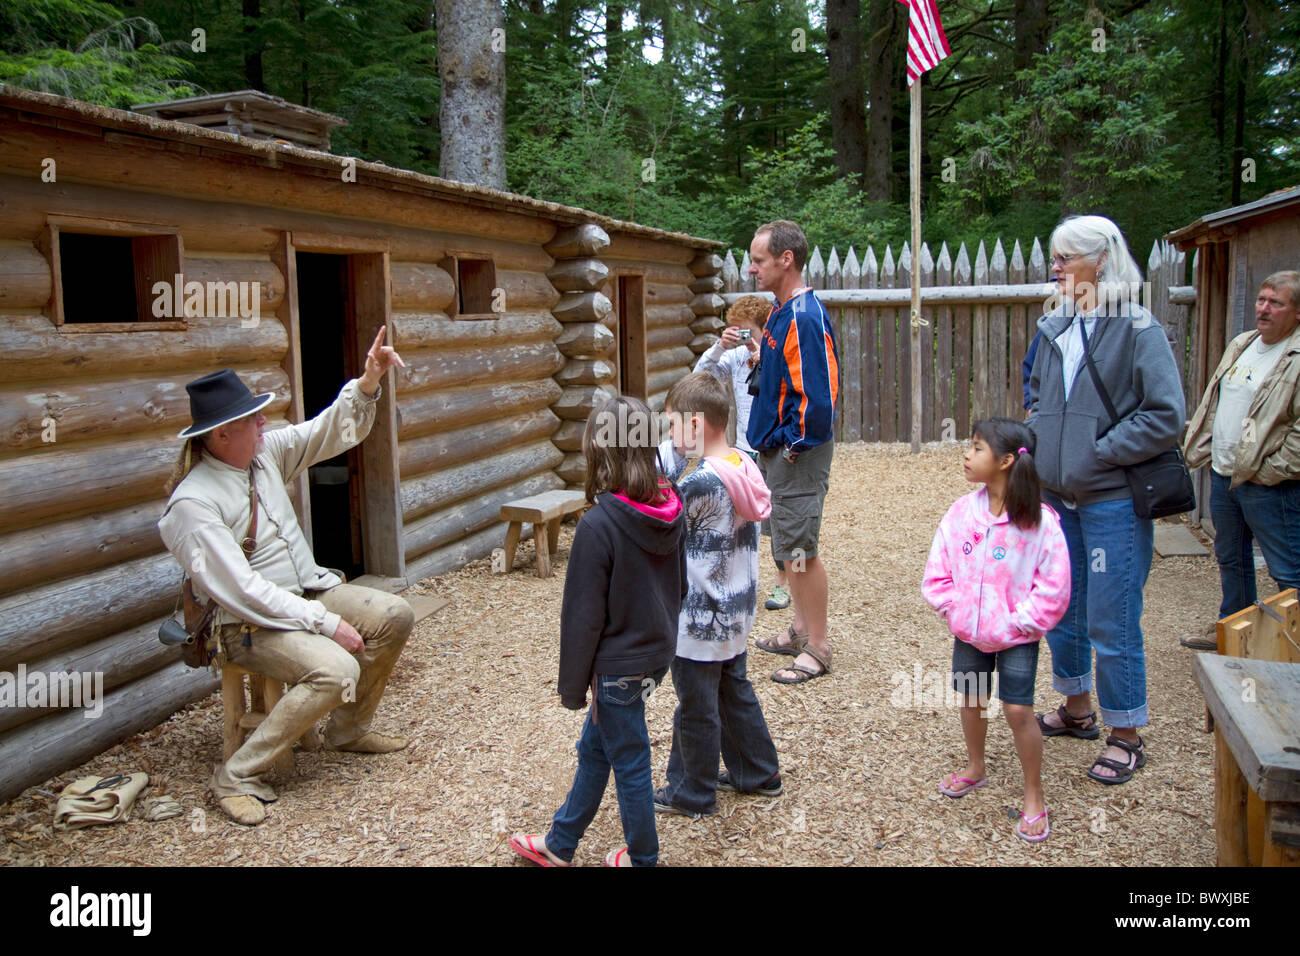 Historical reenactment at Fort Clatsop National Memorial near Astoria, Oregon, USA. - Stock Image